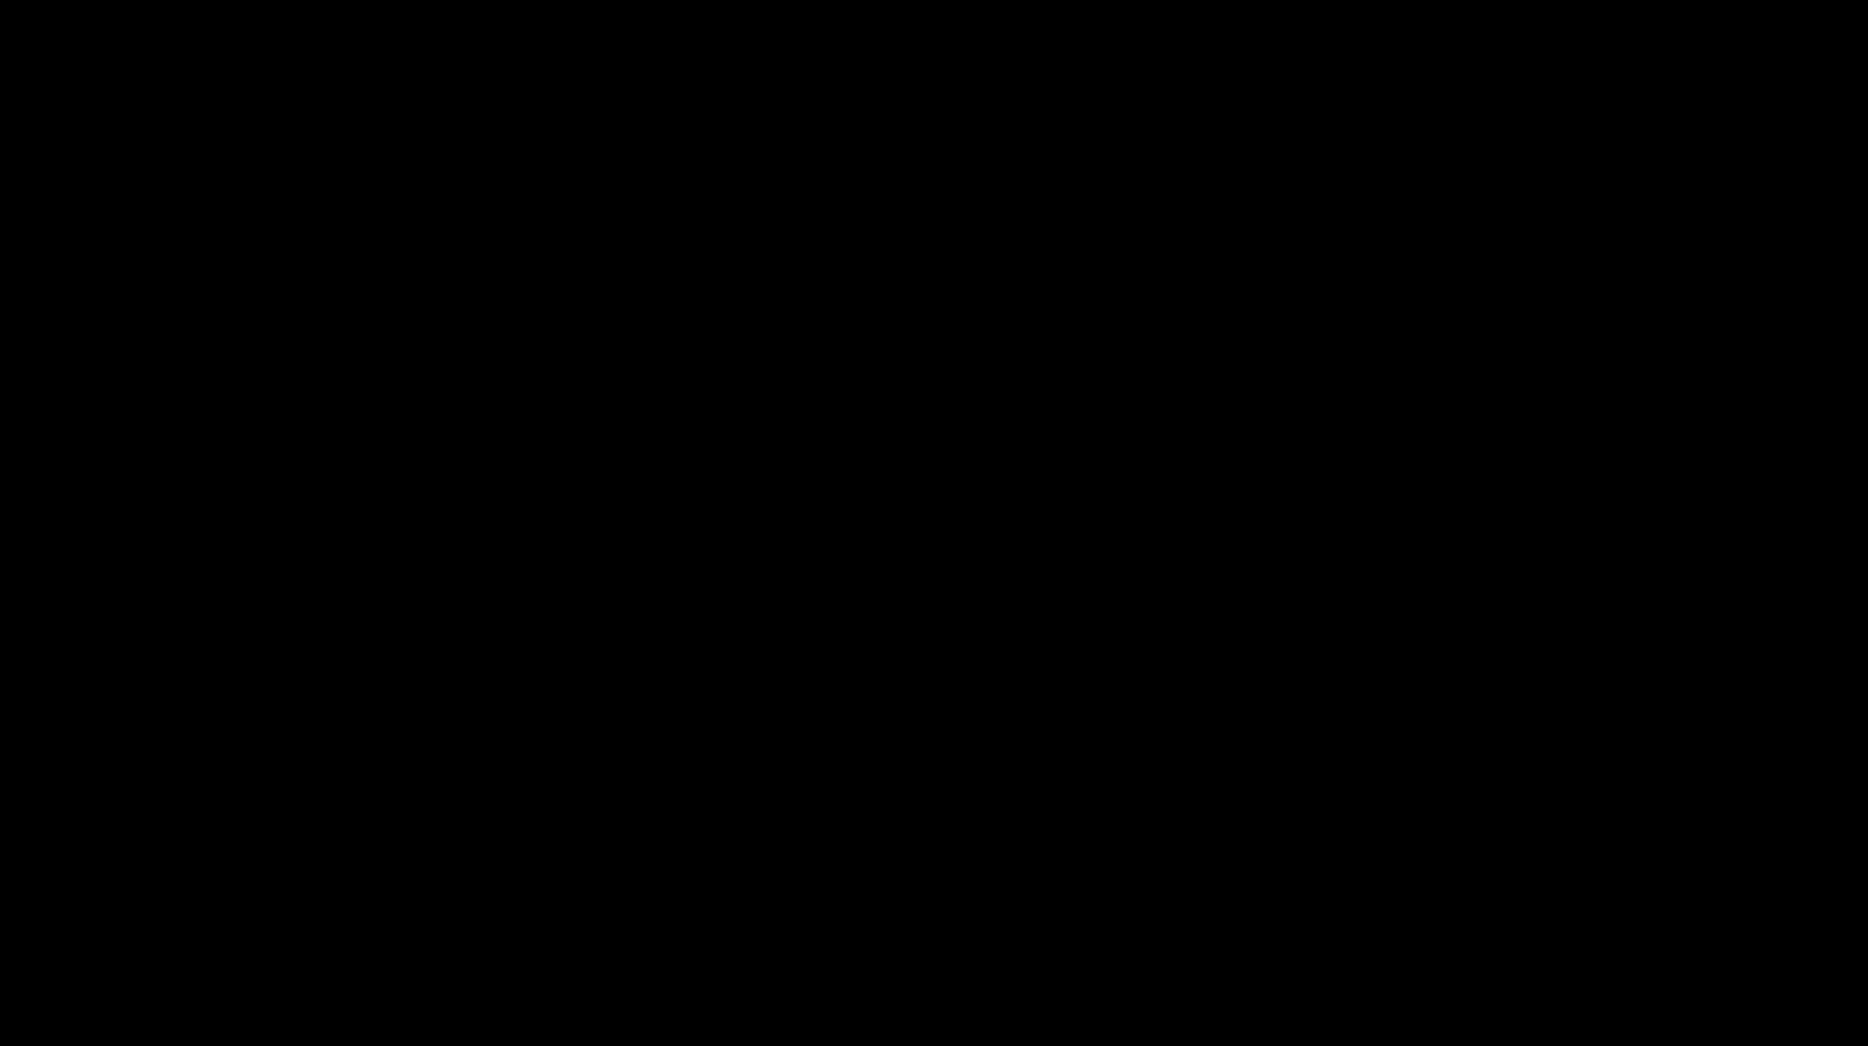 N-(p-Coumaroyl) serotonin